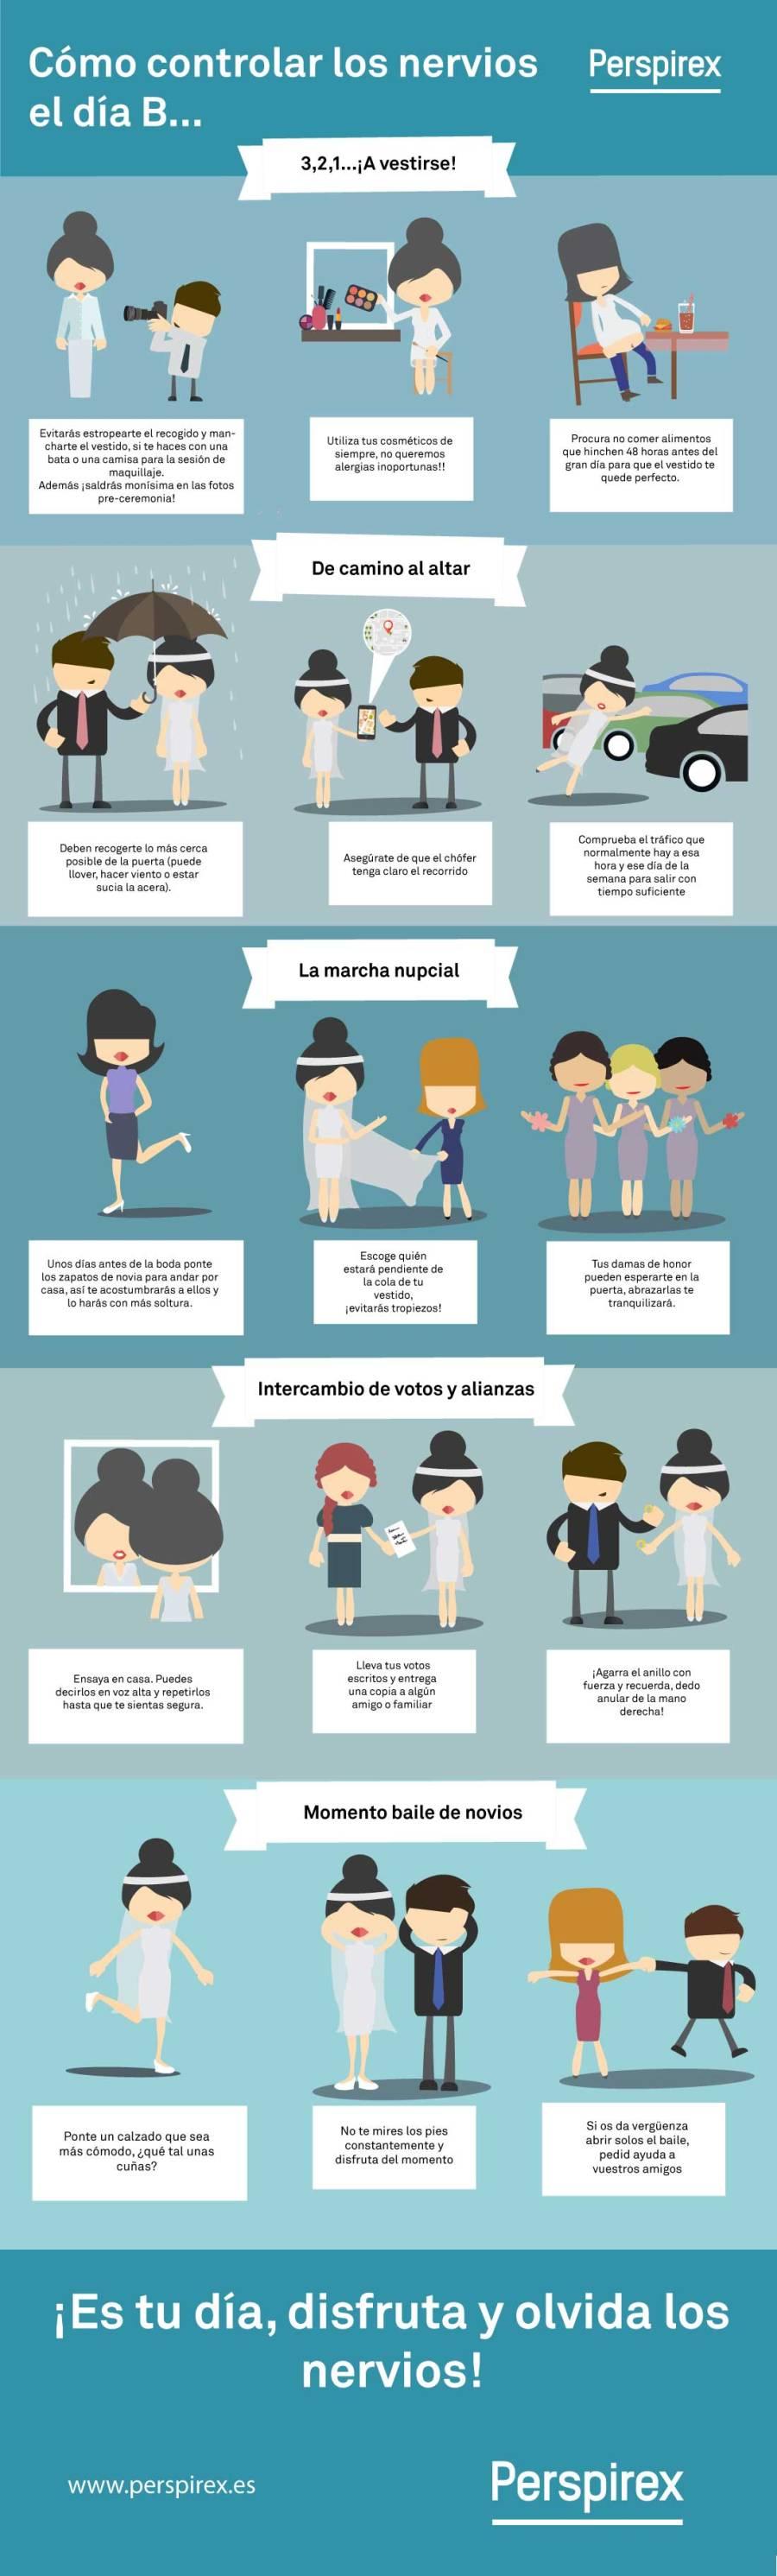 infografia para controlar los nervios antes de la boda